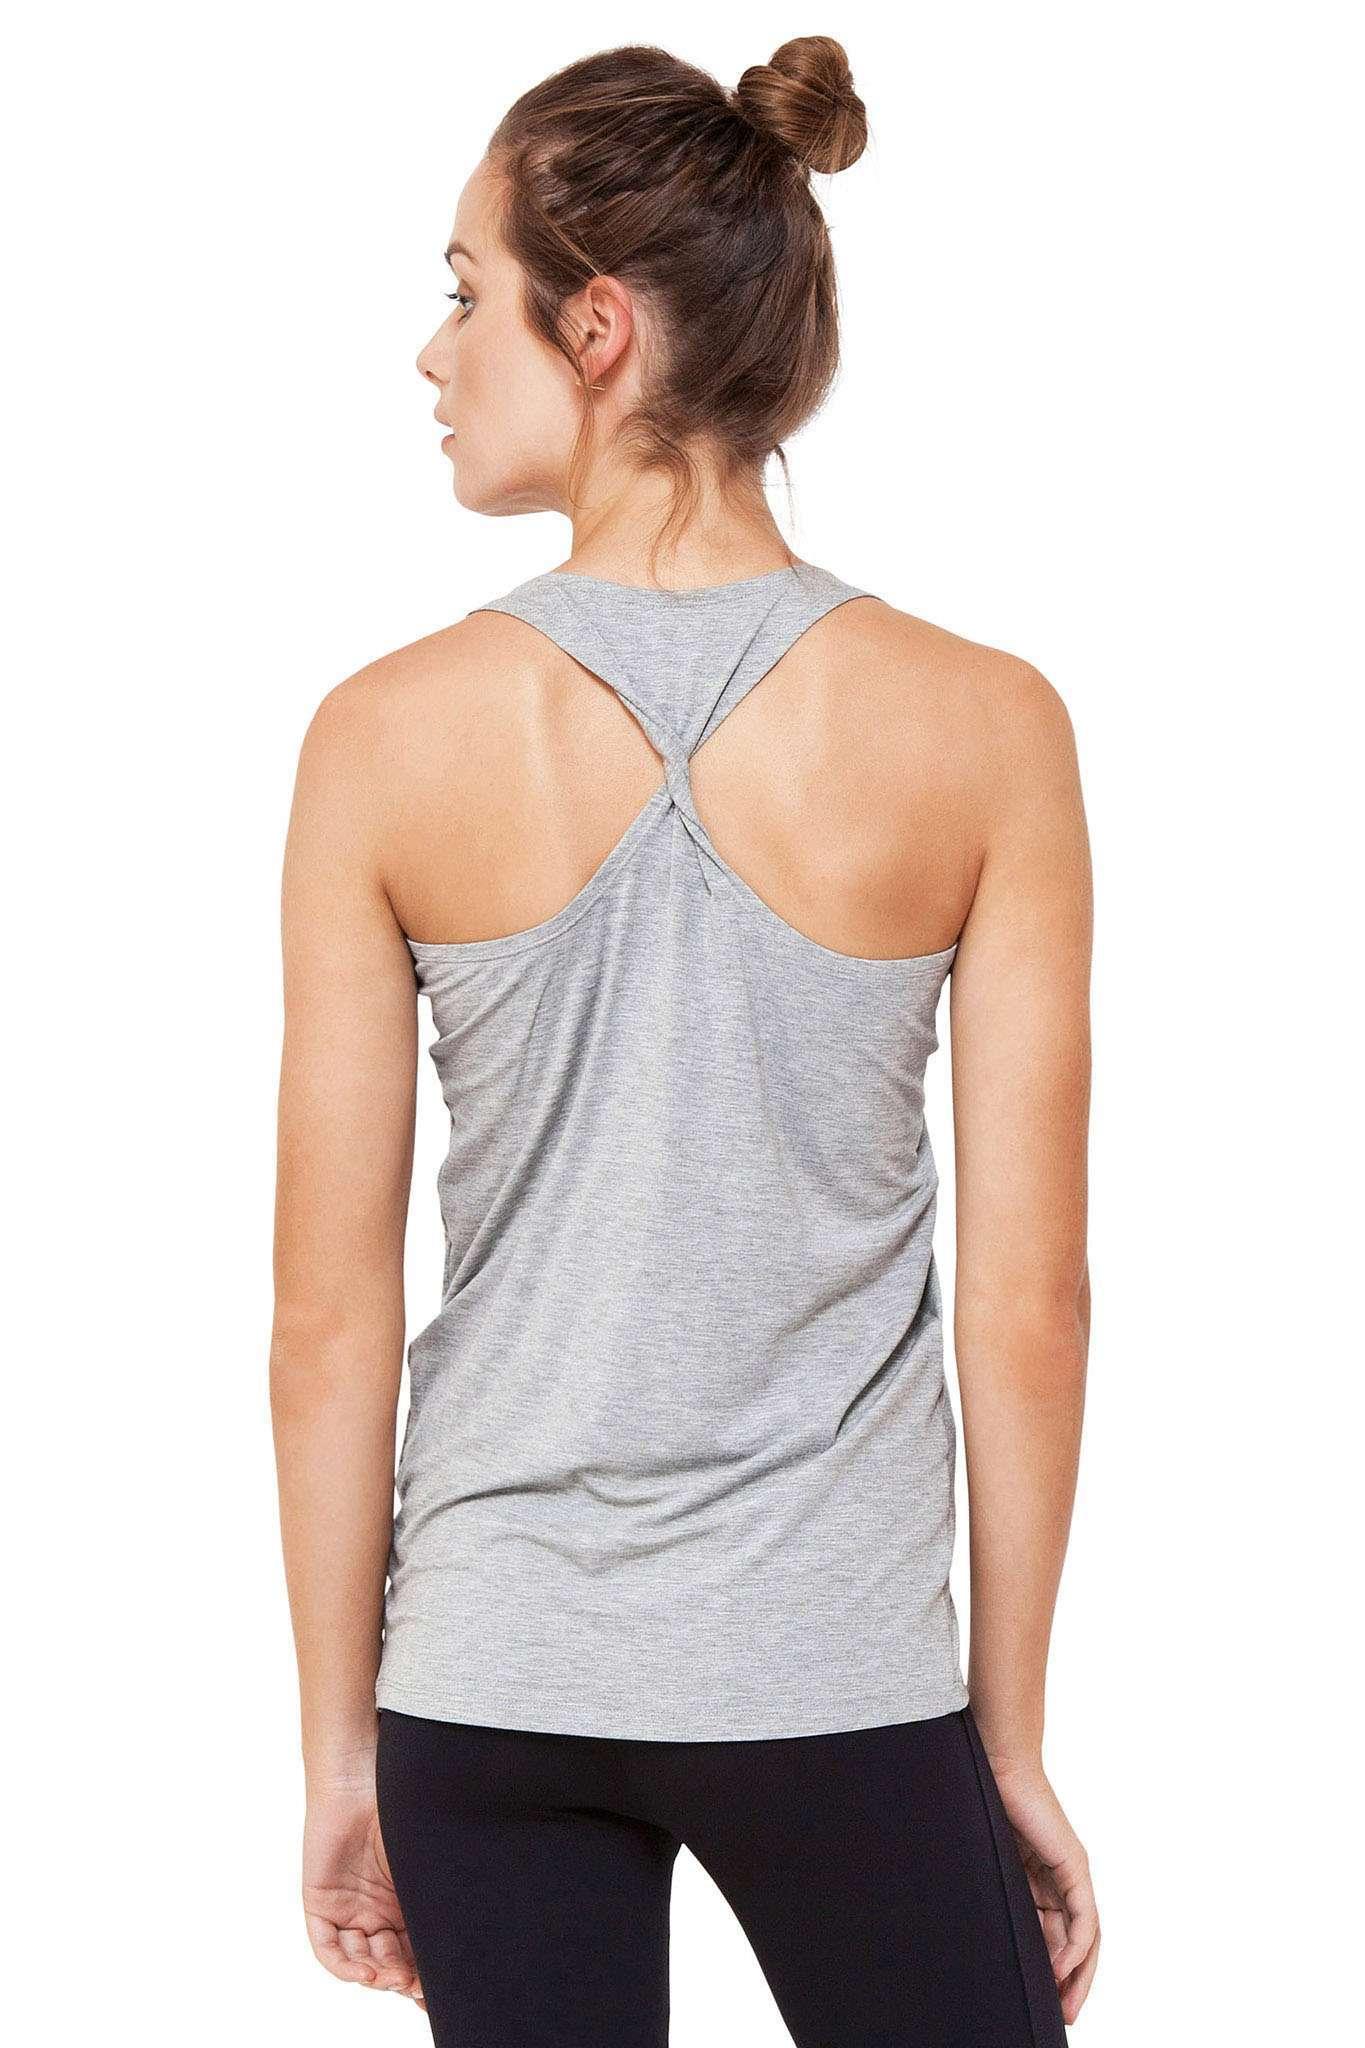 Dharma Bums twisted back bamboo yoga top melange grey